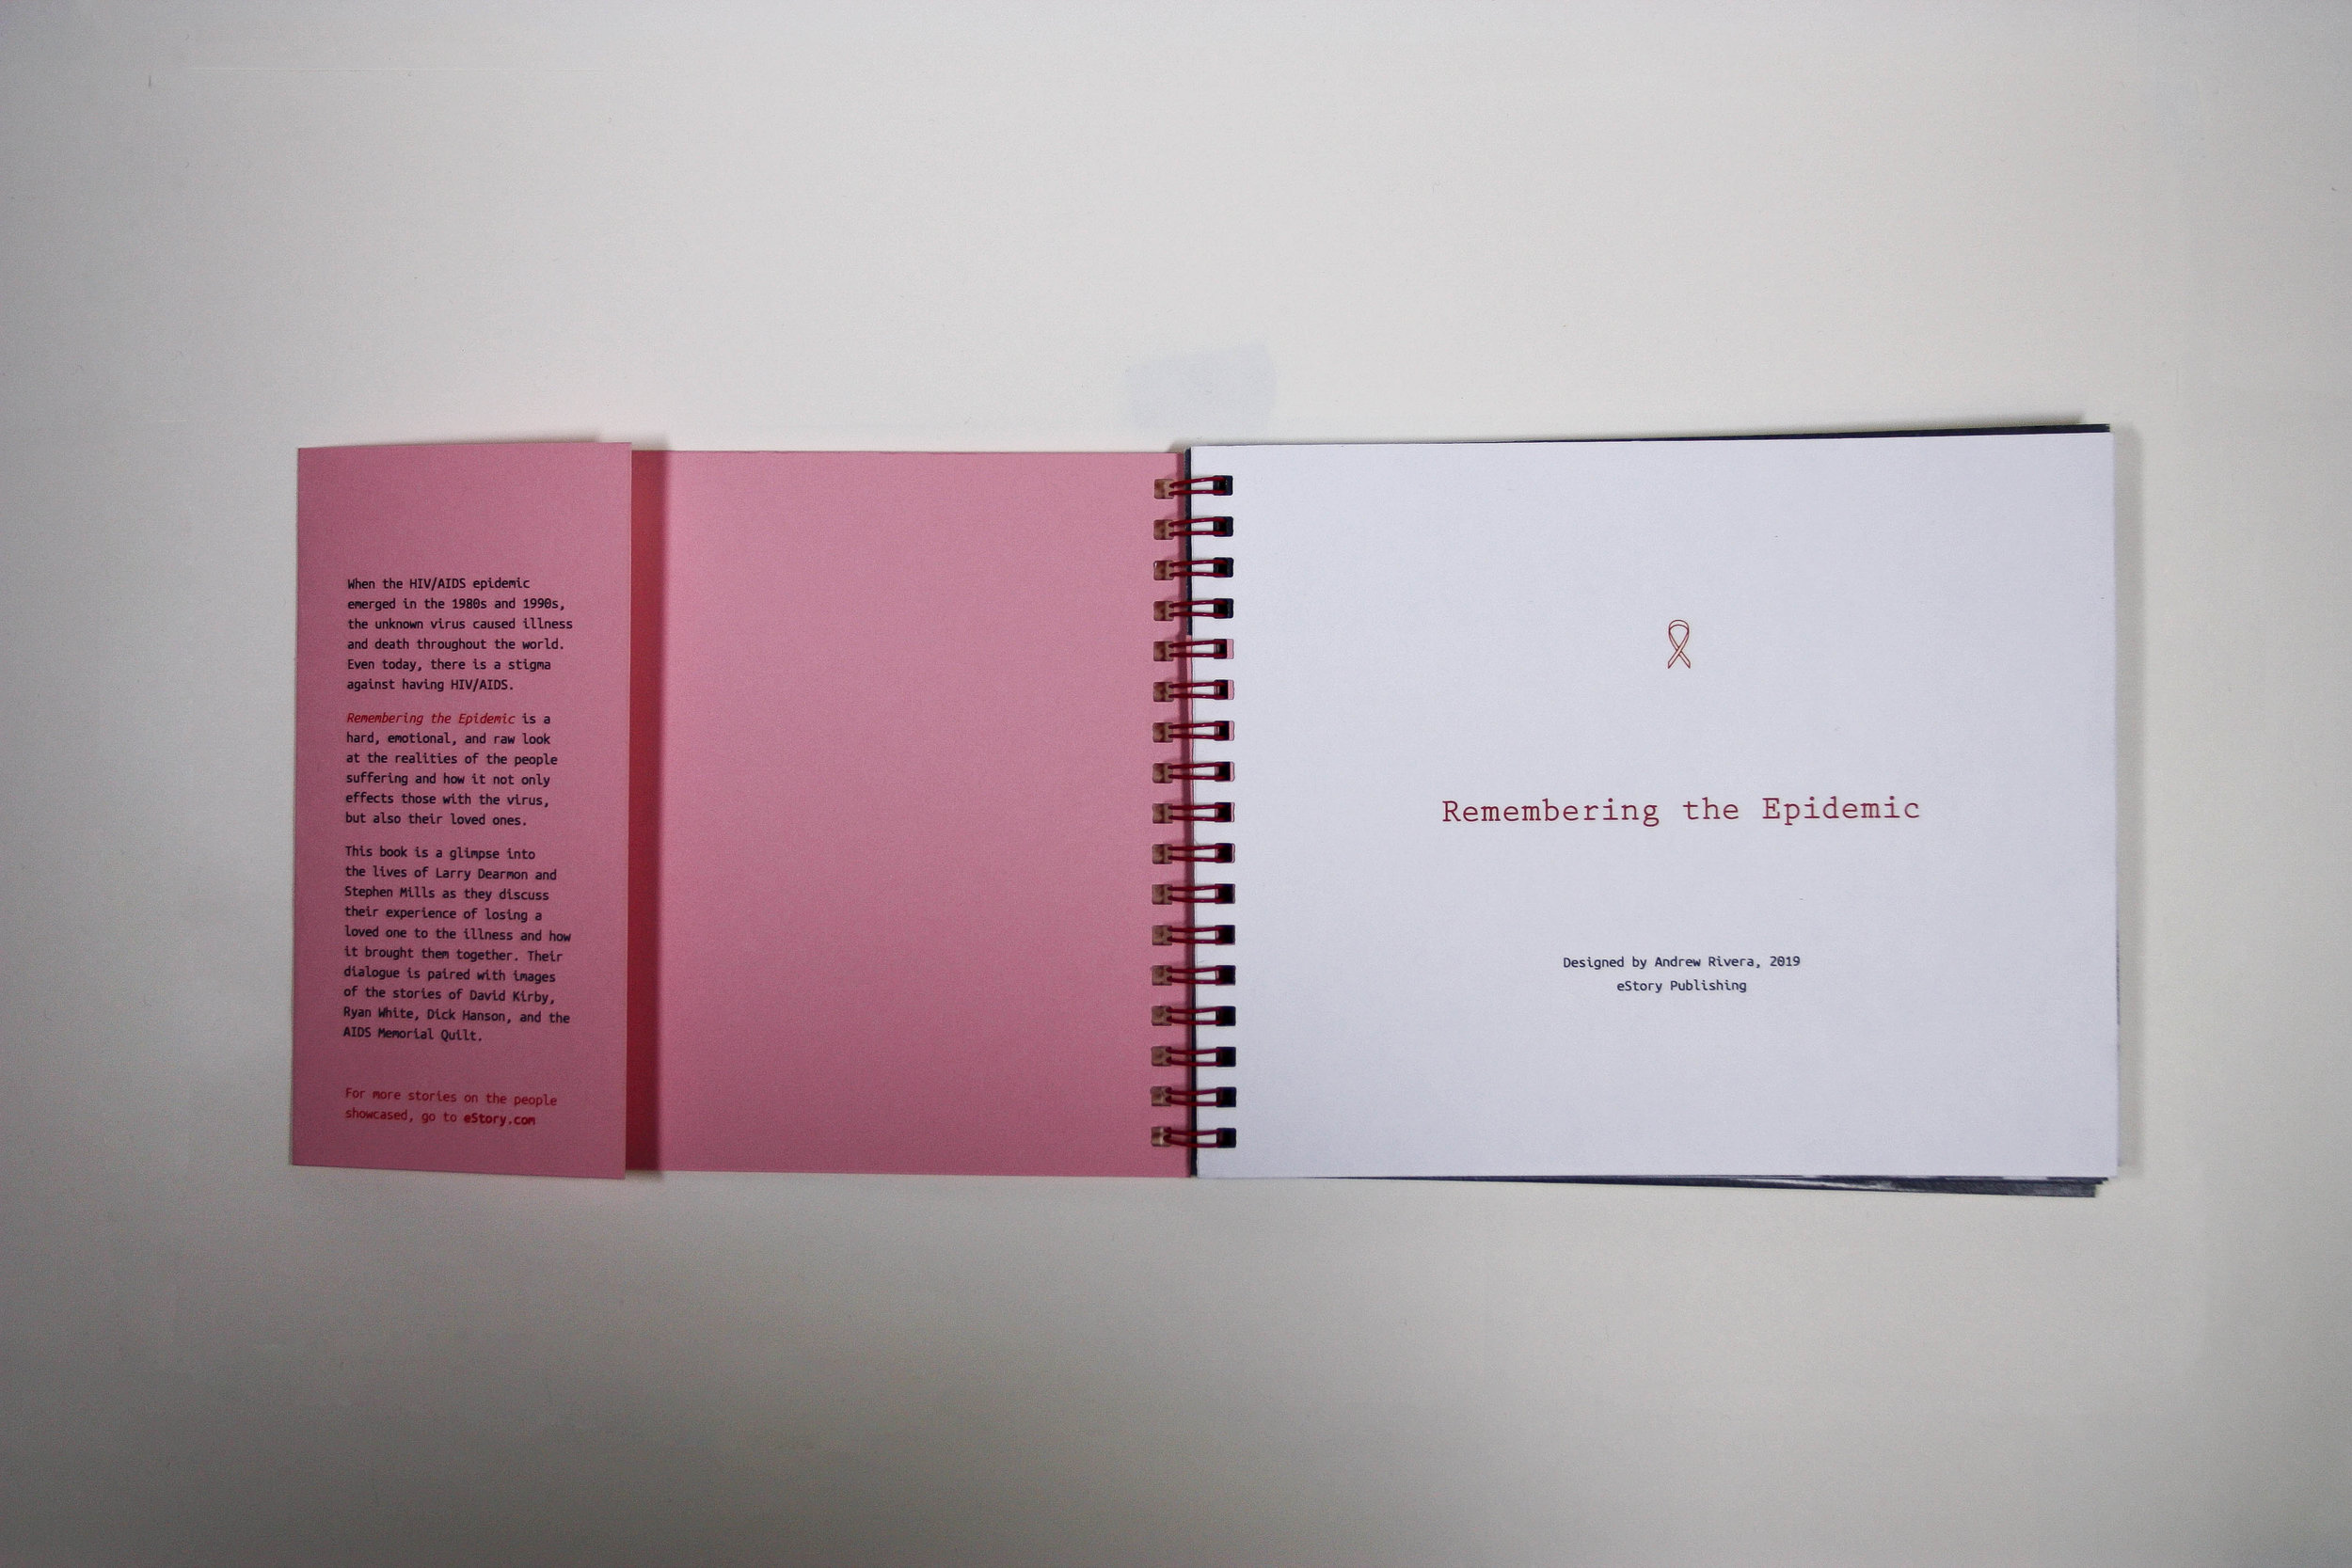 estory-bookimages-2.jpg